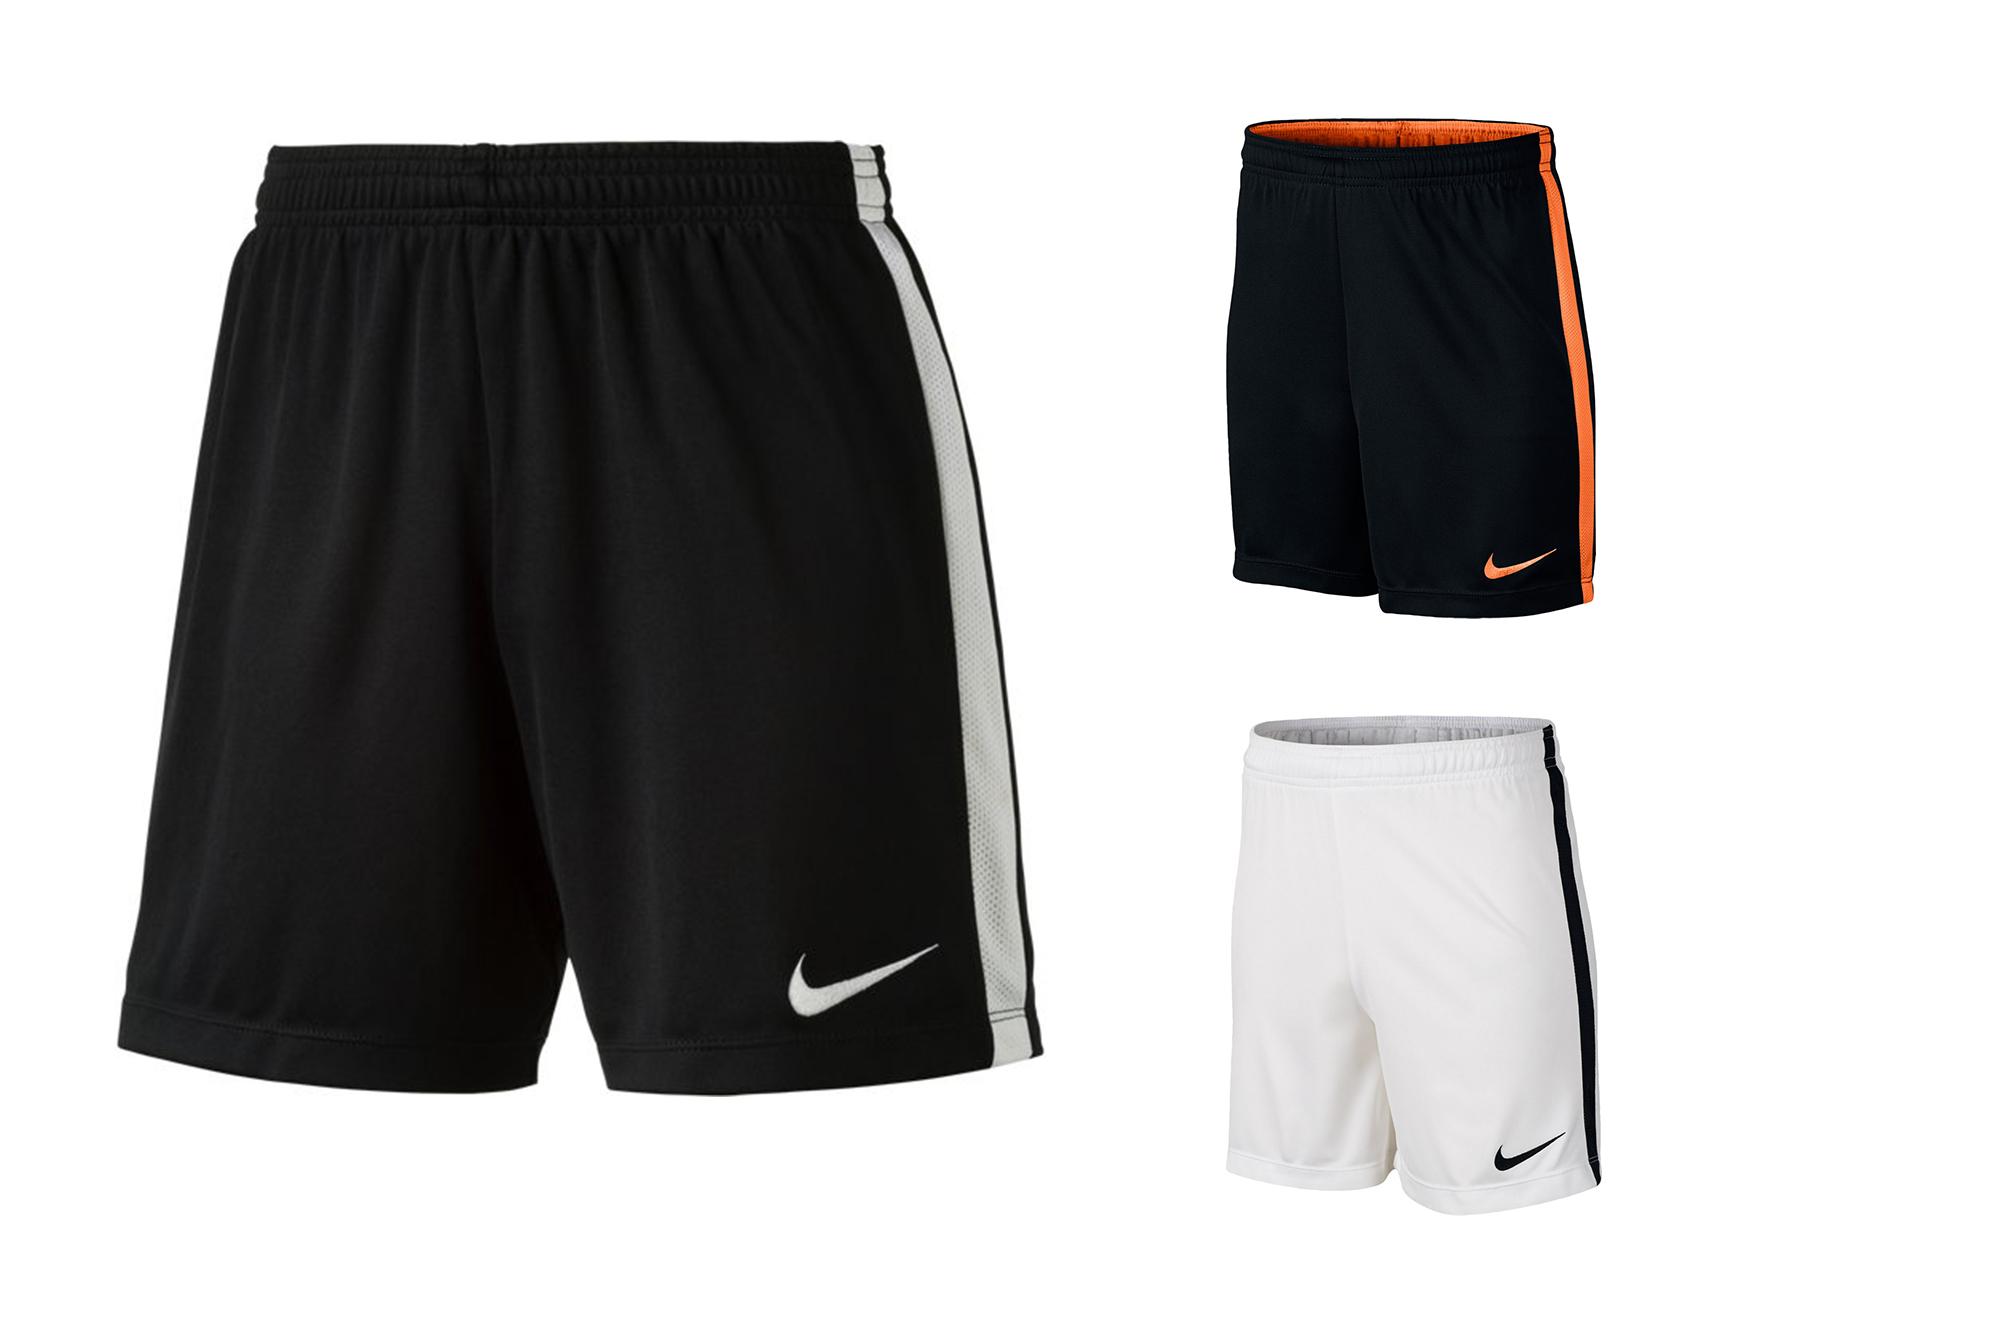 Details zu Nike Kinder Sporthose ACDMY K Trainingshose Turnhose kurze Shorts Jogginghose